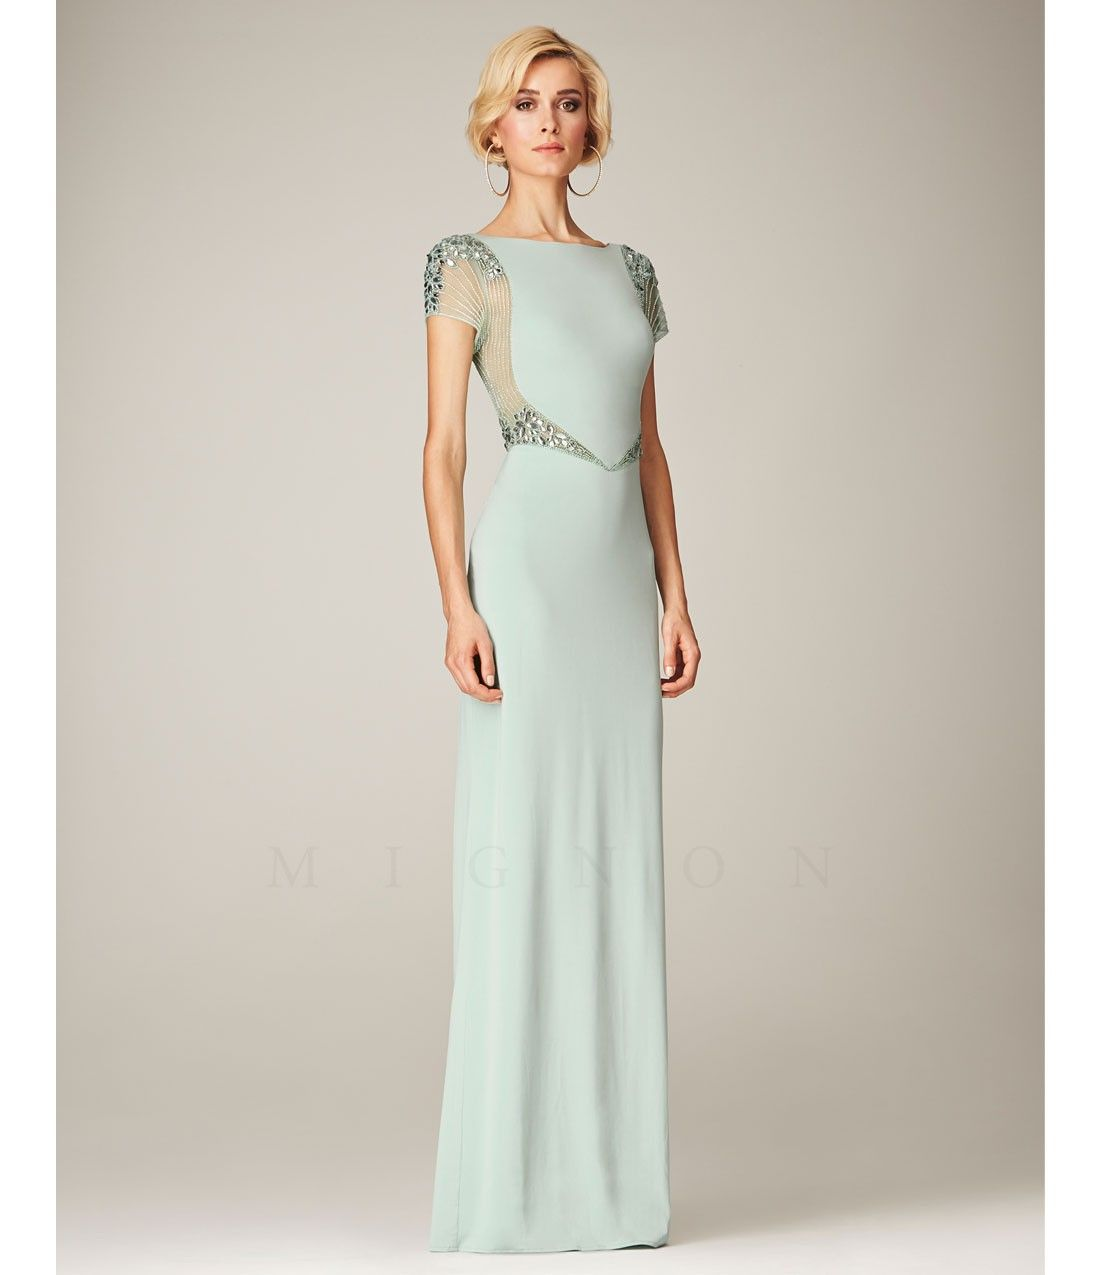 Images of Beaded Dresses Long - Reikian